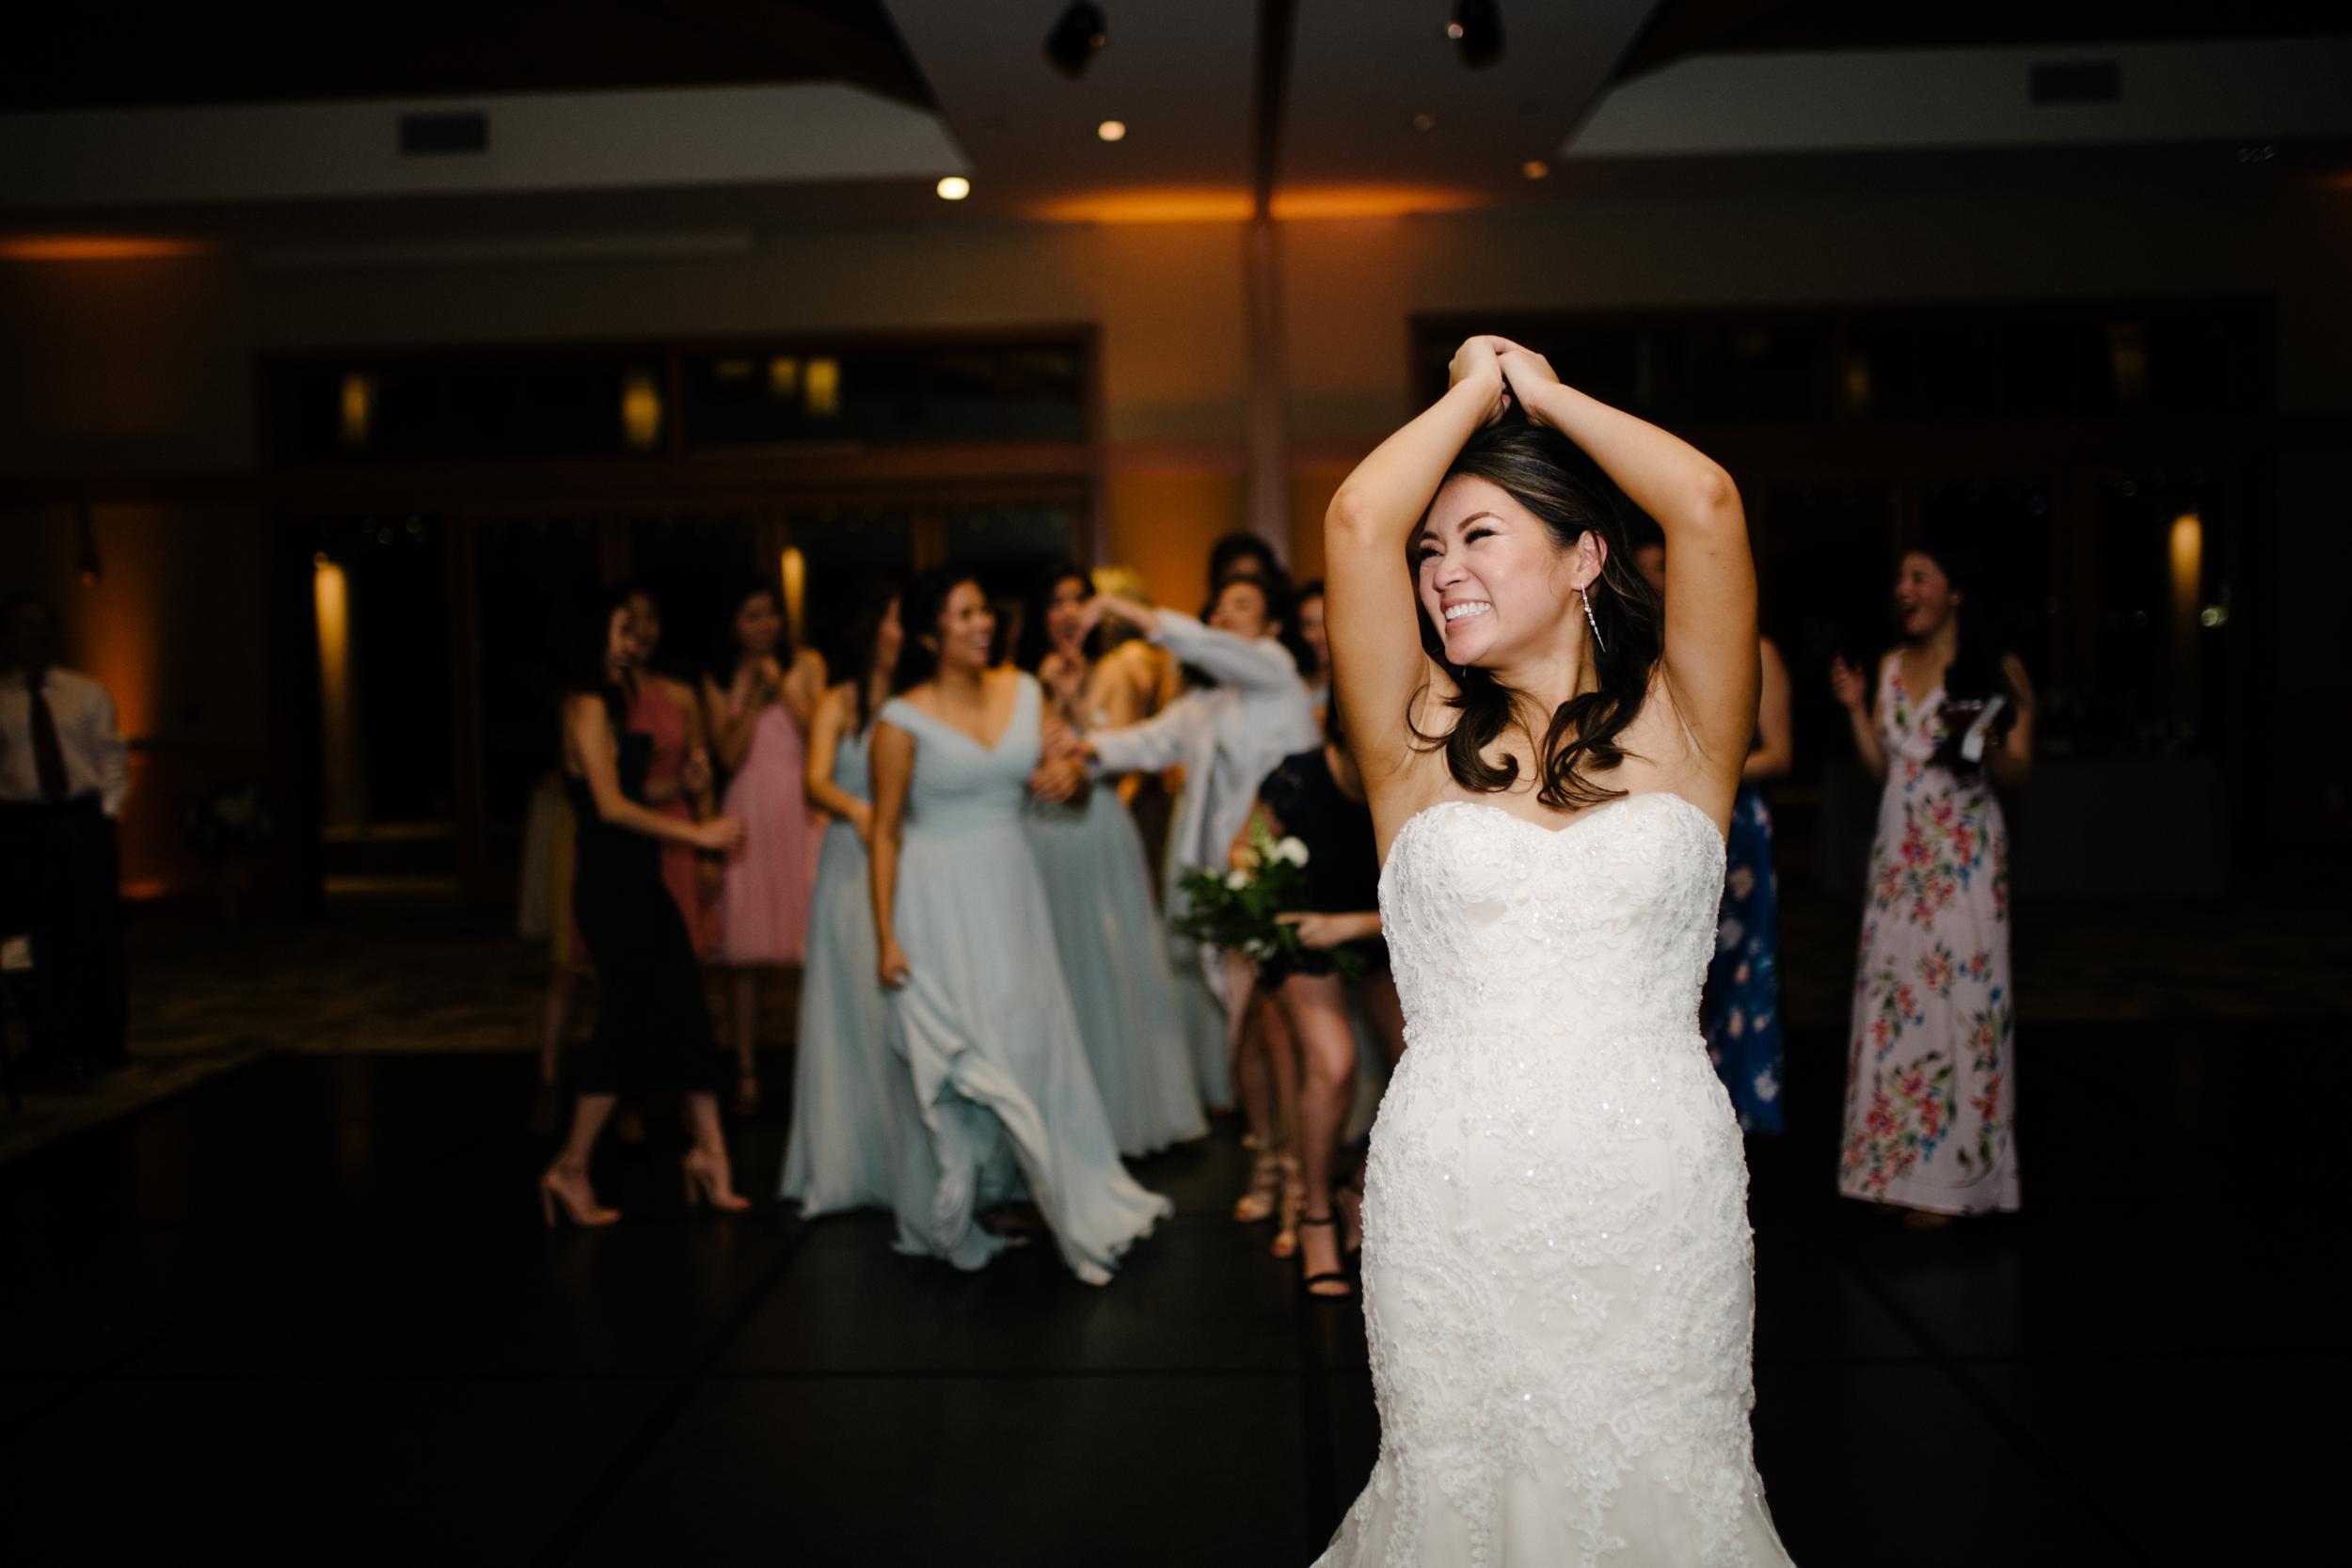 wedding_coronado_community_center-40.jpg